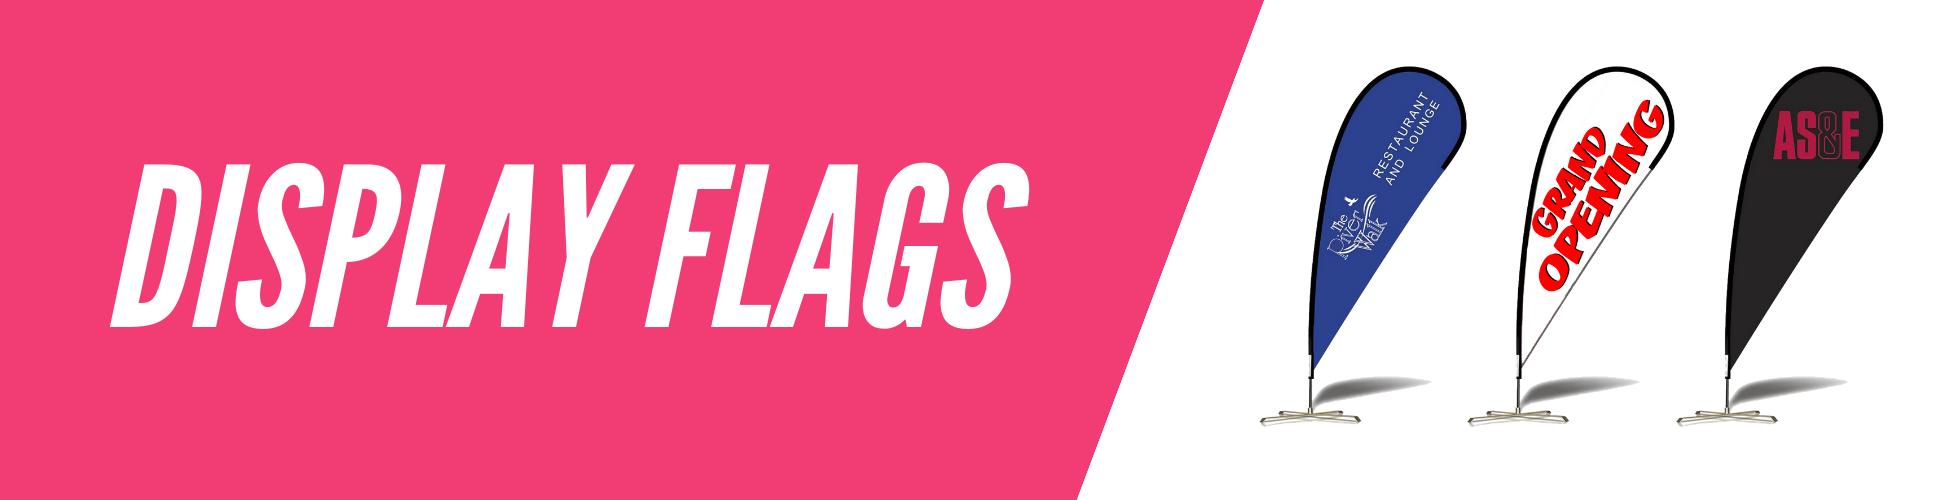 display-flags.png